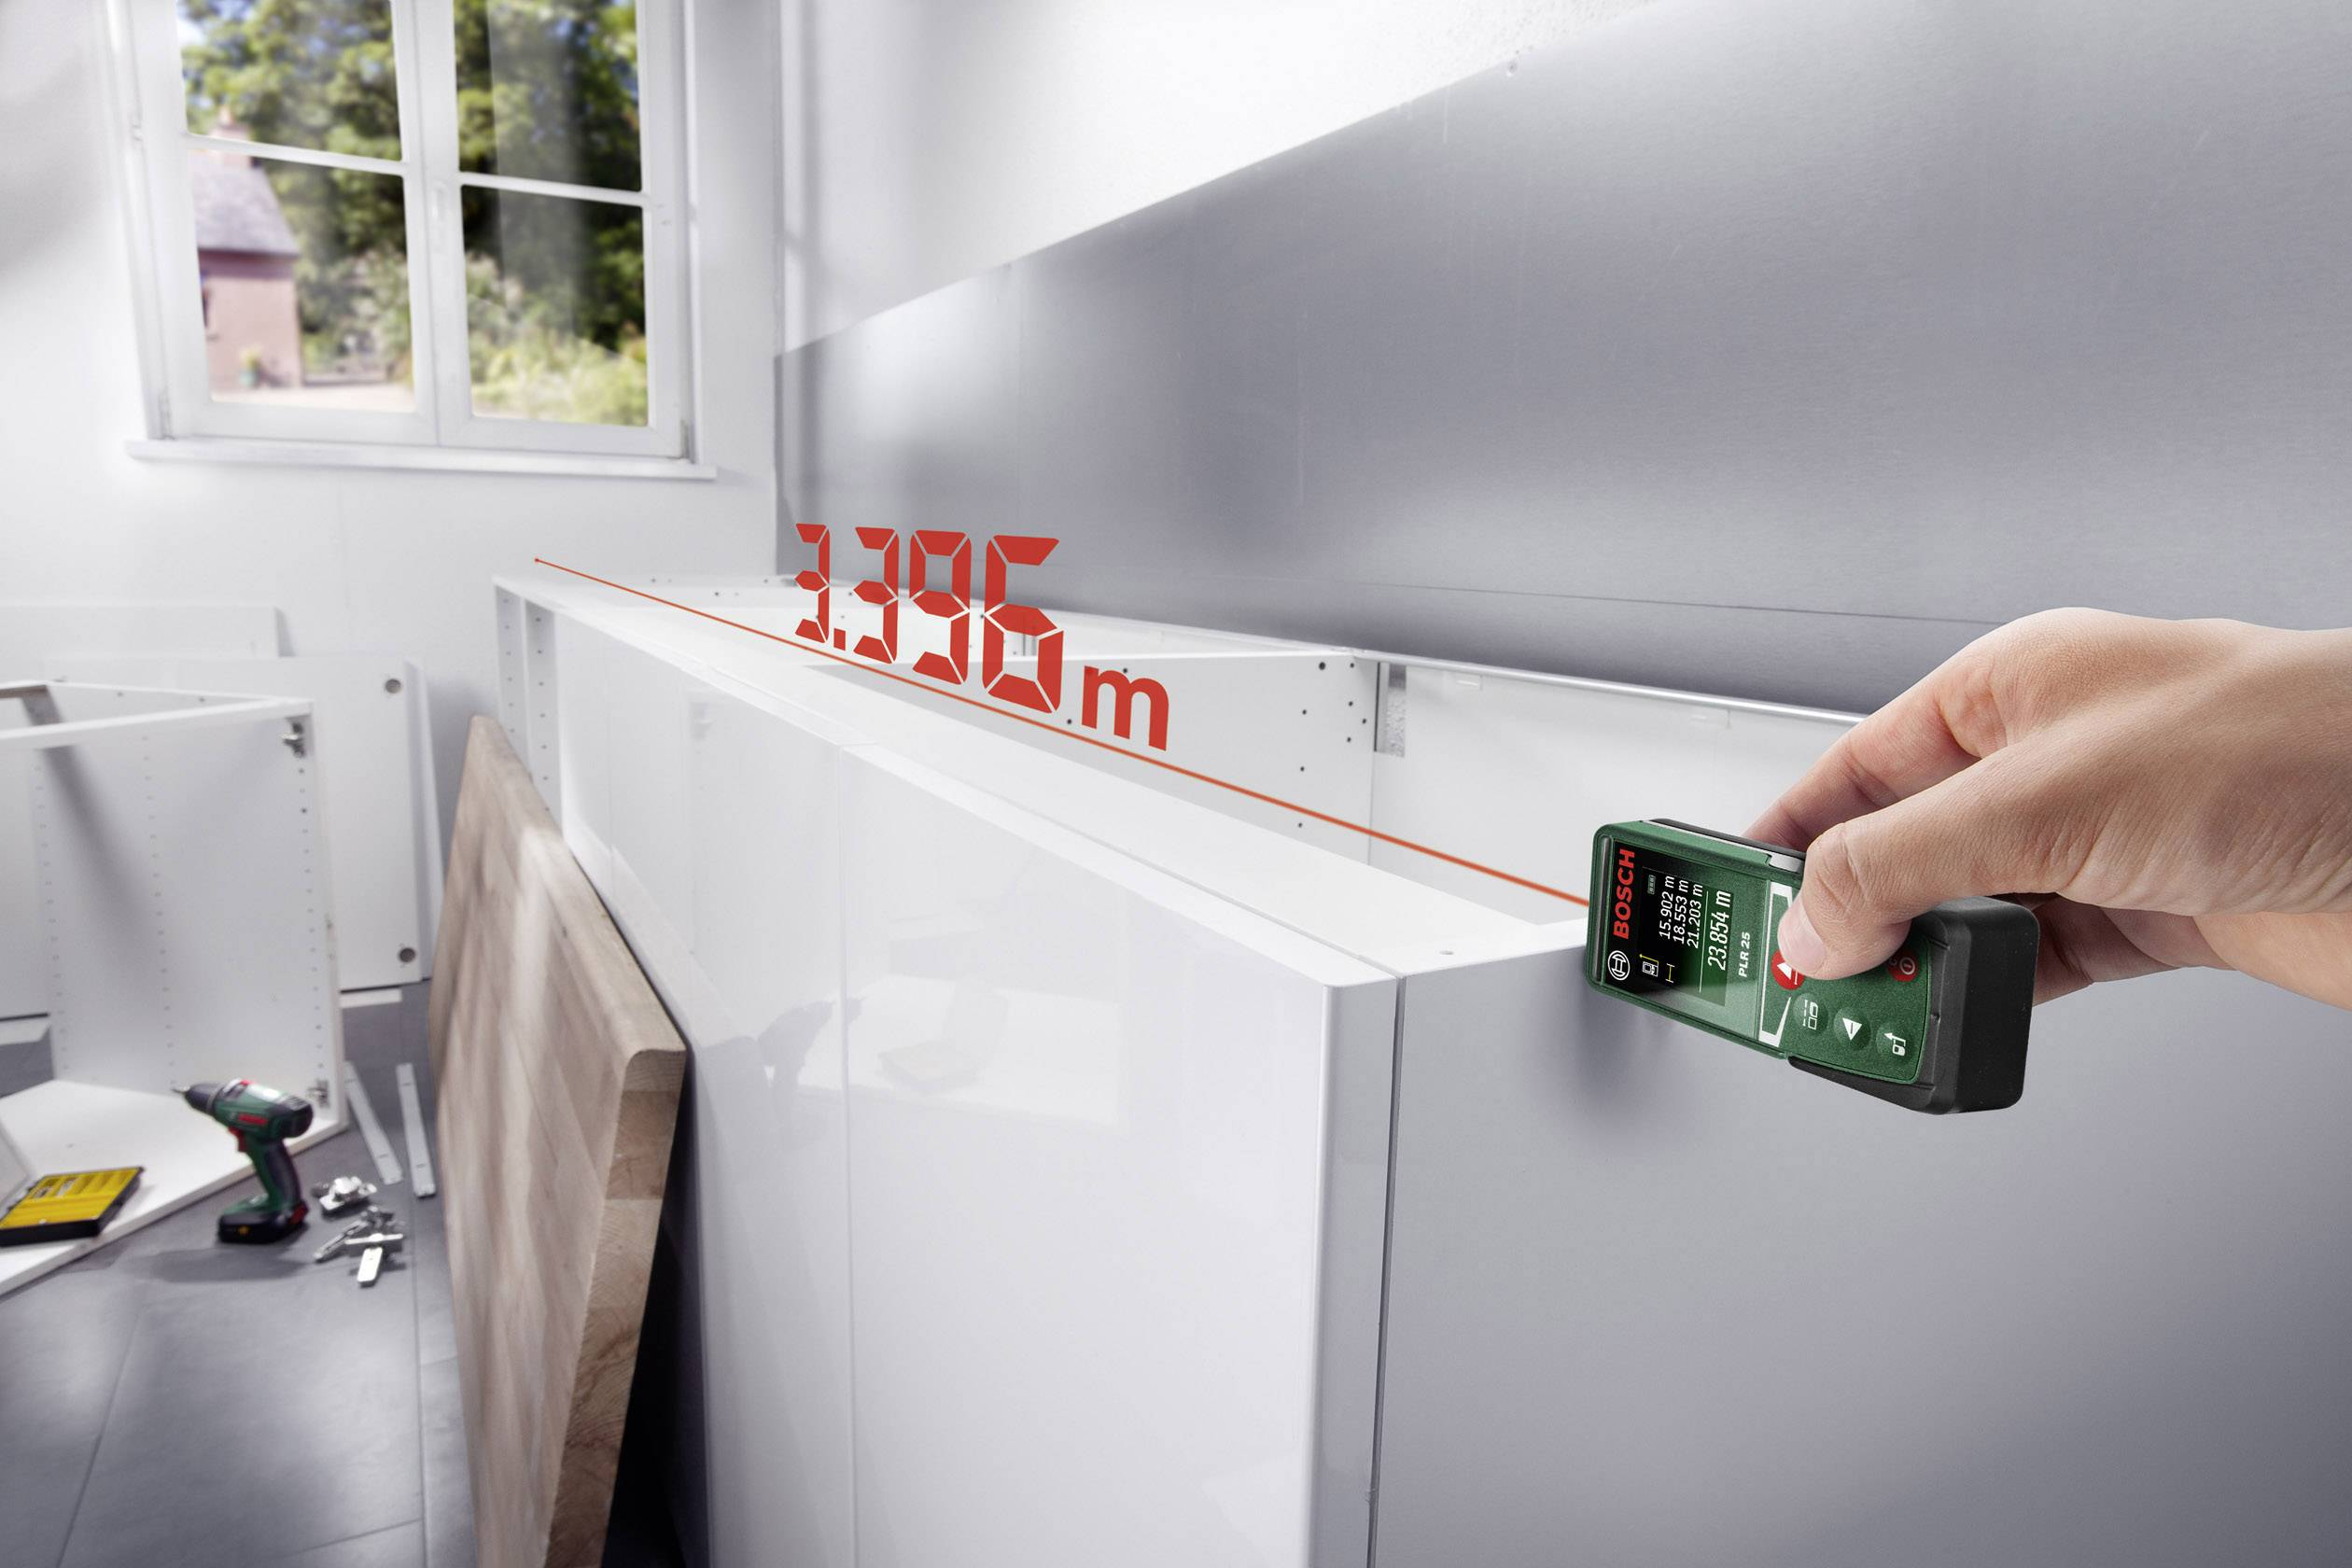 Laser Entfernungsmesser Nivellier : Bosch home and garden plr laser entfernungsmesser messbereich